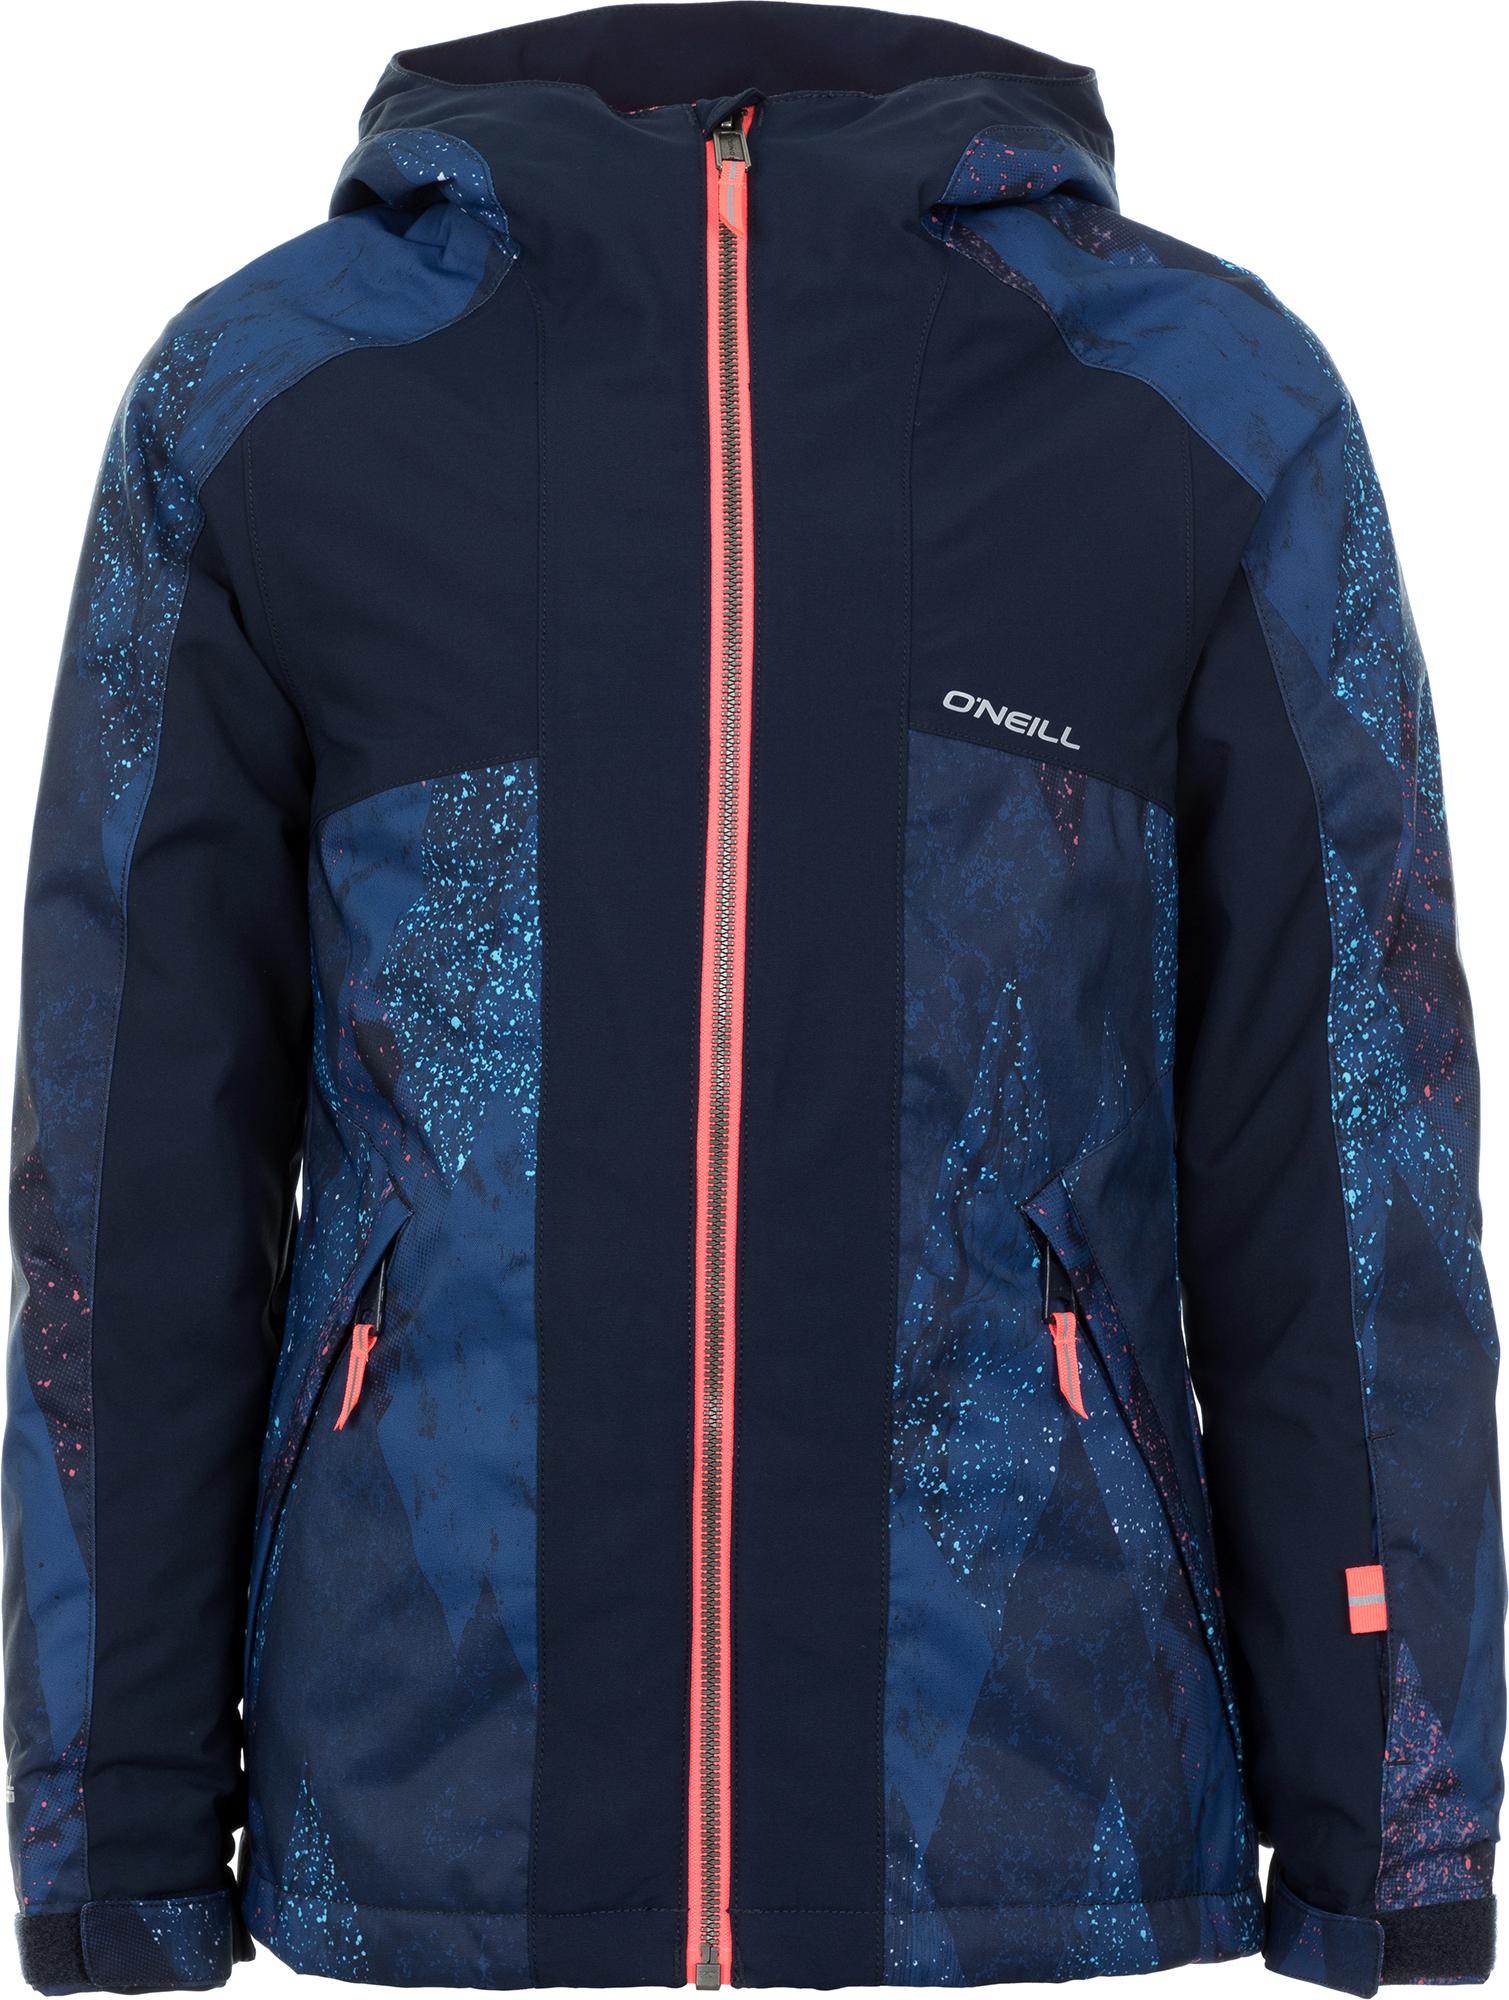 O'Neill Куртка утепленная для девочек O'Neill Pg Allure, размер 164